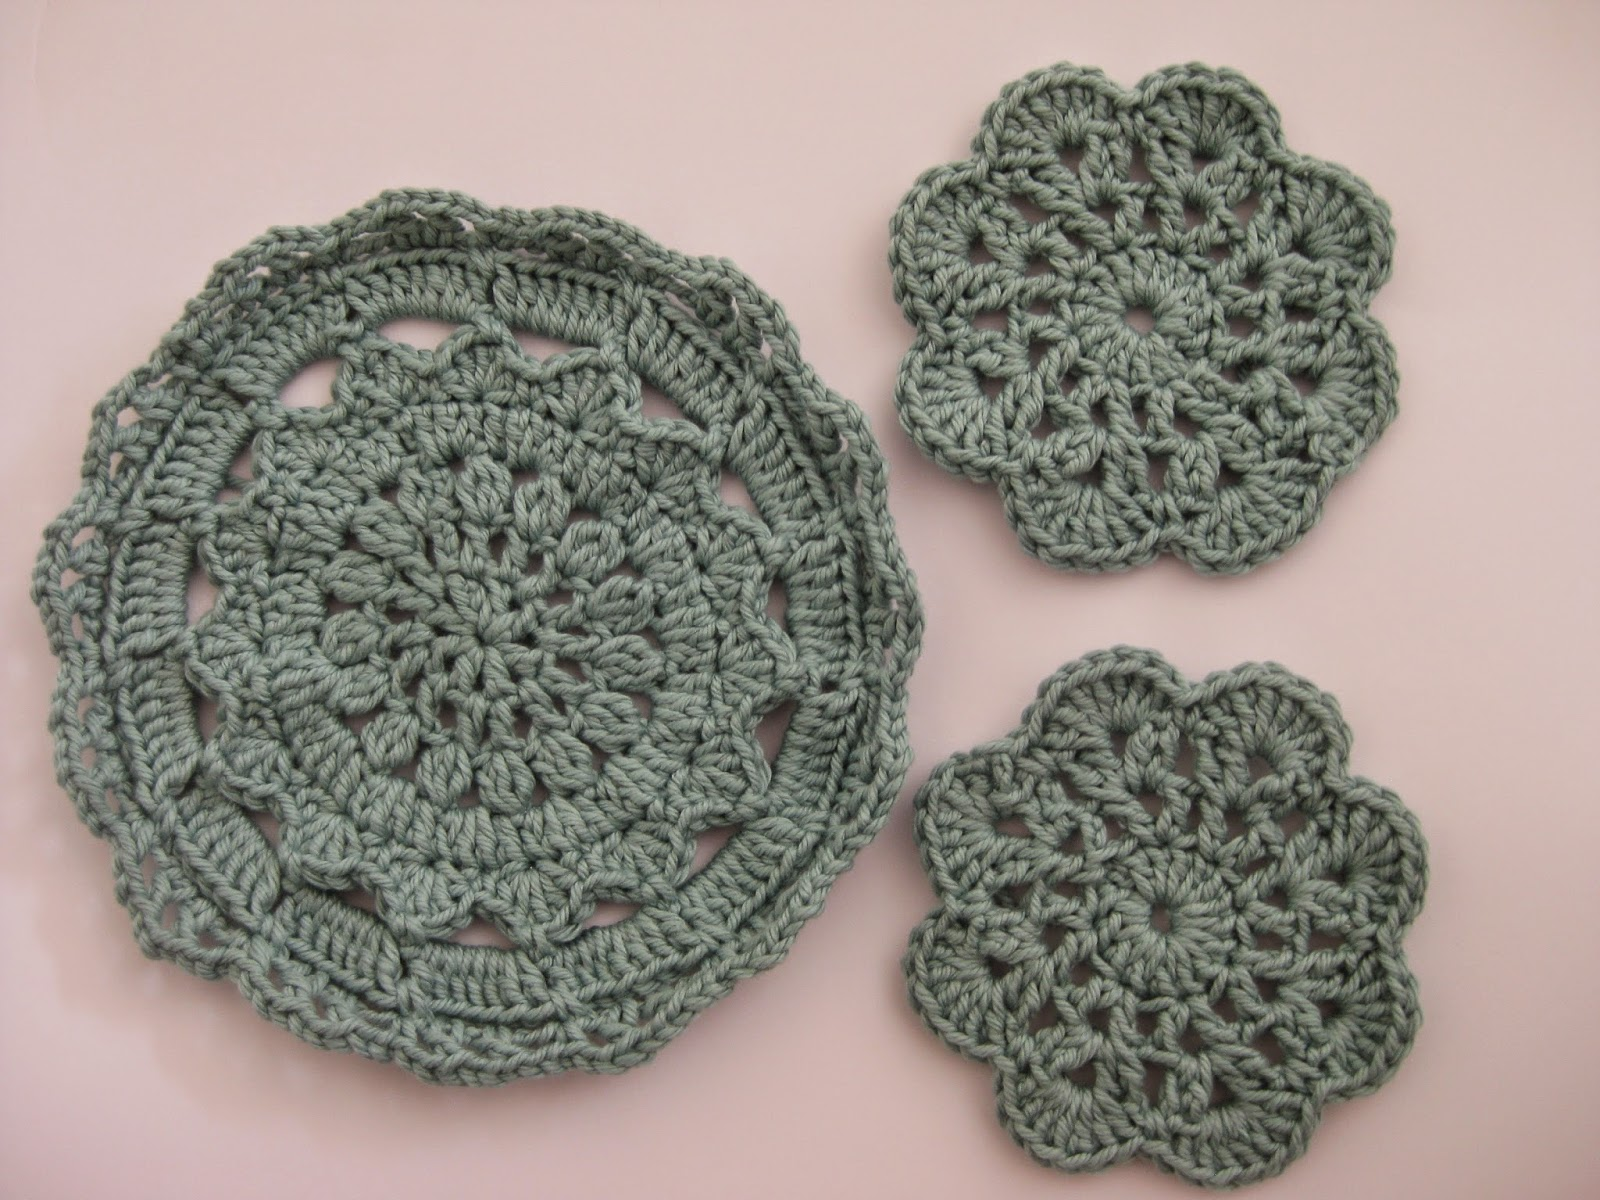 Craftyrie Taa Daa Some Pretty Coasters